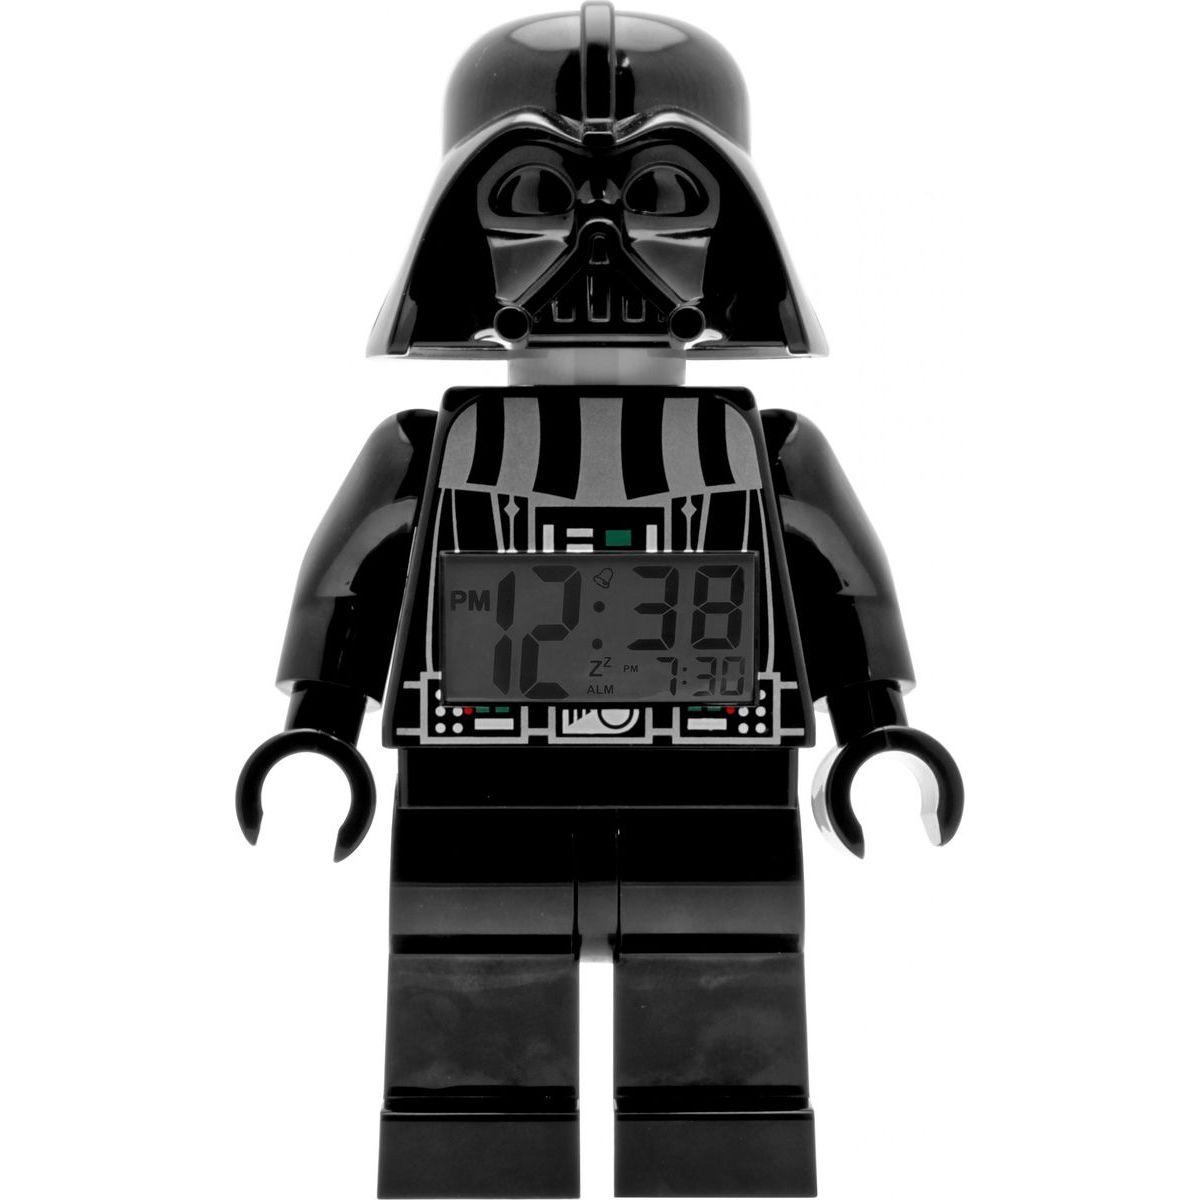 LEGO Star Wars Darth Vader Hodiny s budíkem